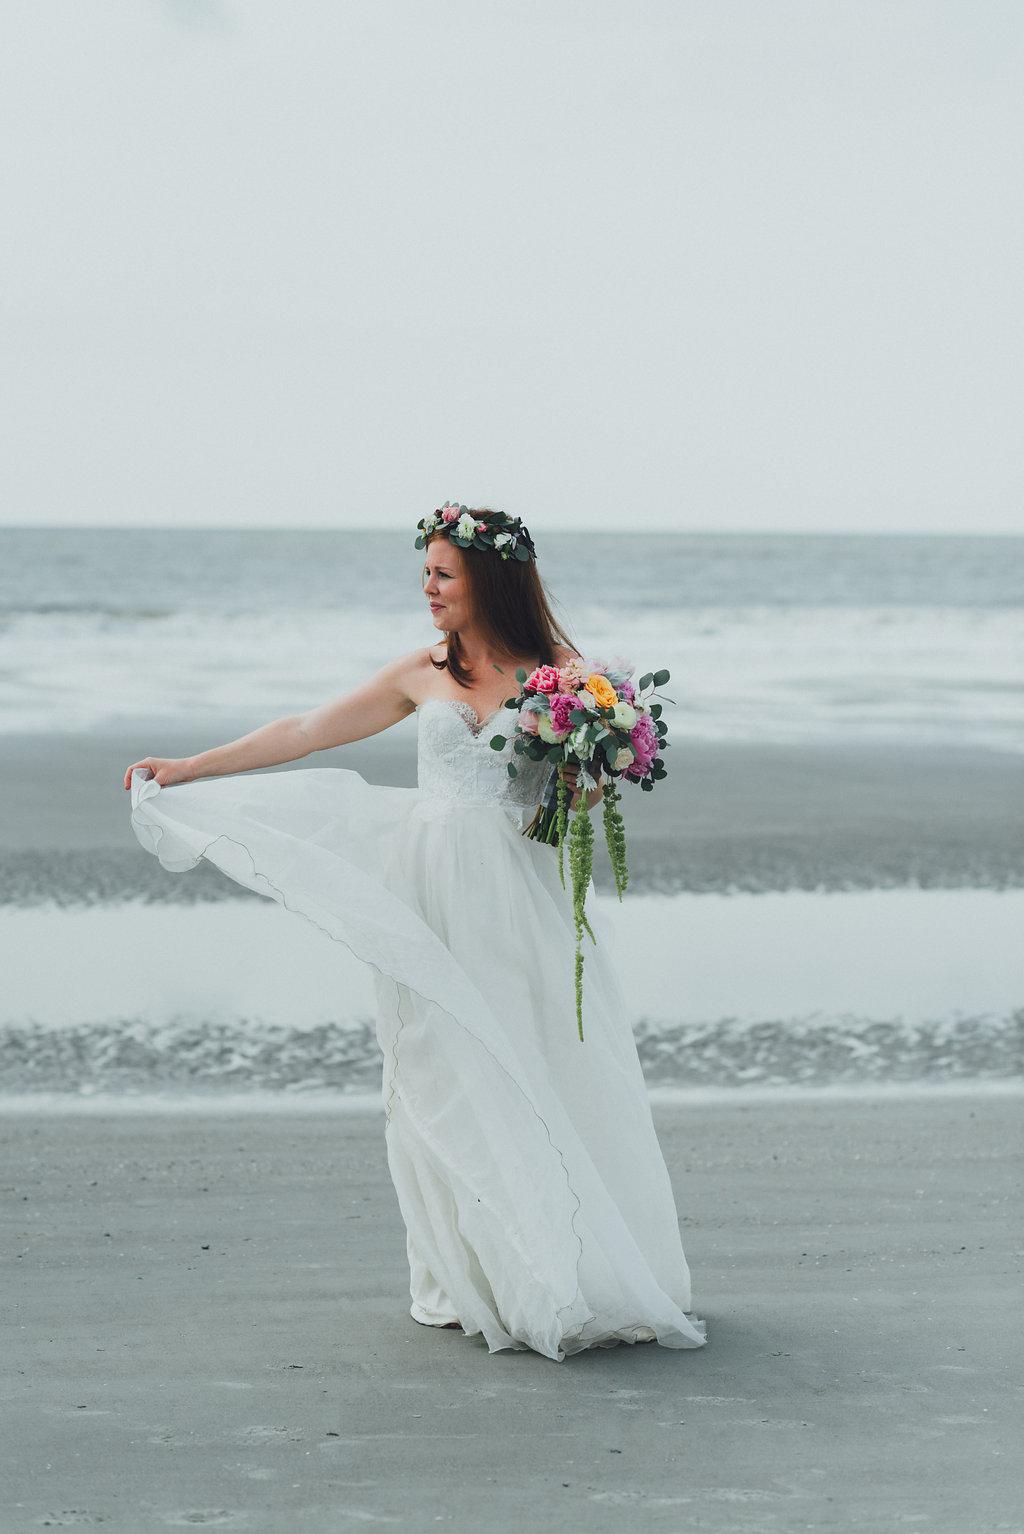 Urban-Poppy-Southern-Wedding-Mallory-and-Justin-photography-ivory-and-beau-bridal-boutique-sarah-seven-marion-boho-bride-indie-bride-indie-wedding-dress-savannah-weddings-hilton-head-weddings-beach-wedding-15.jpg